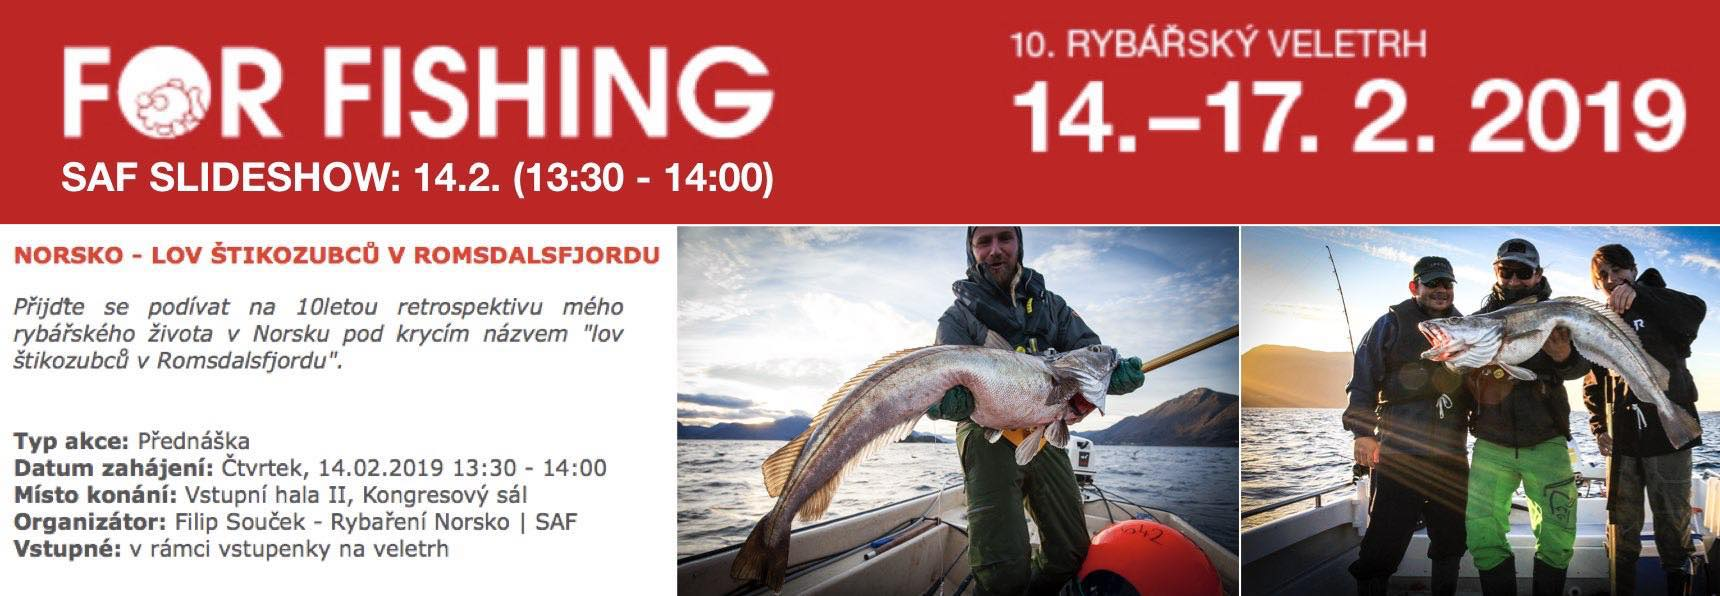 FOR FISHING 2019 - mořský rybolov SAF